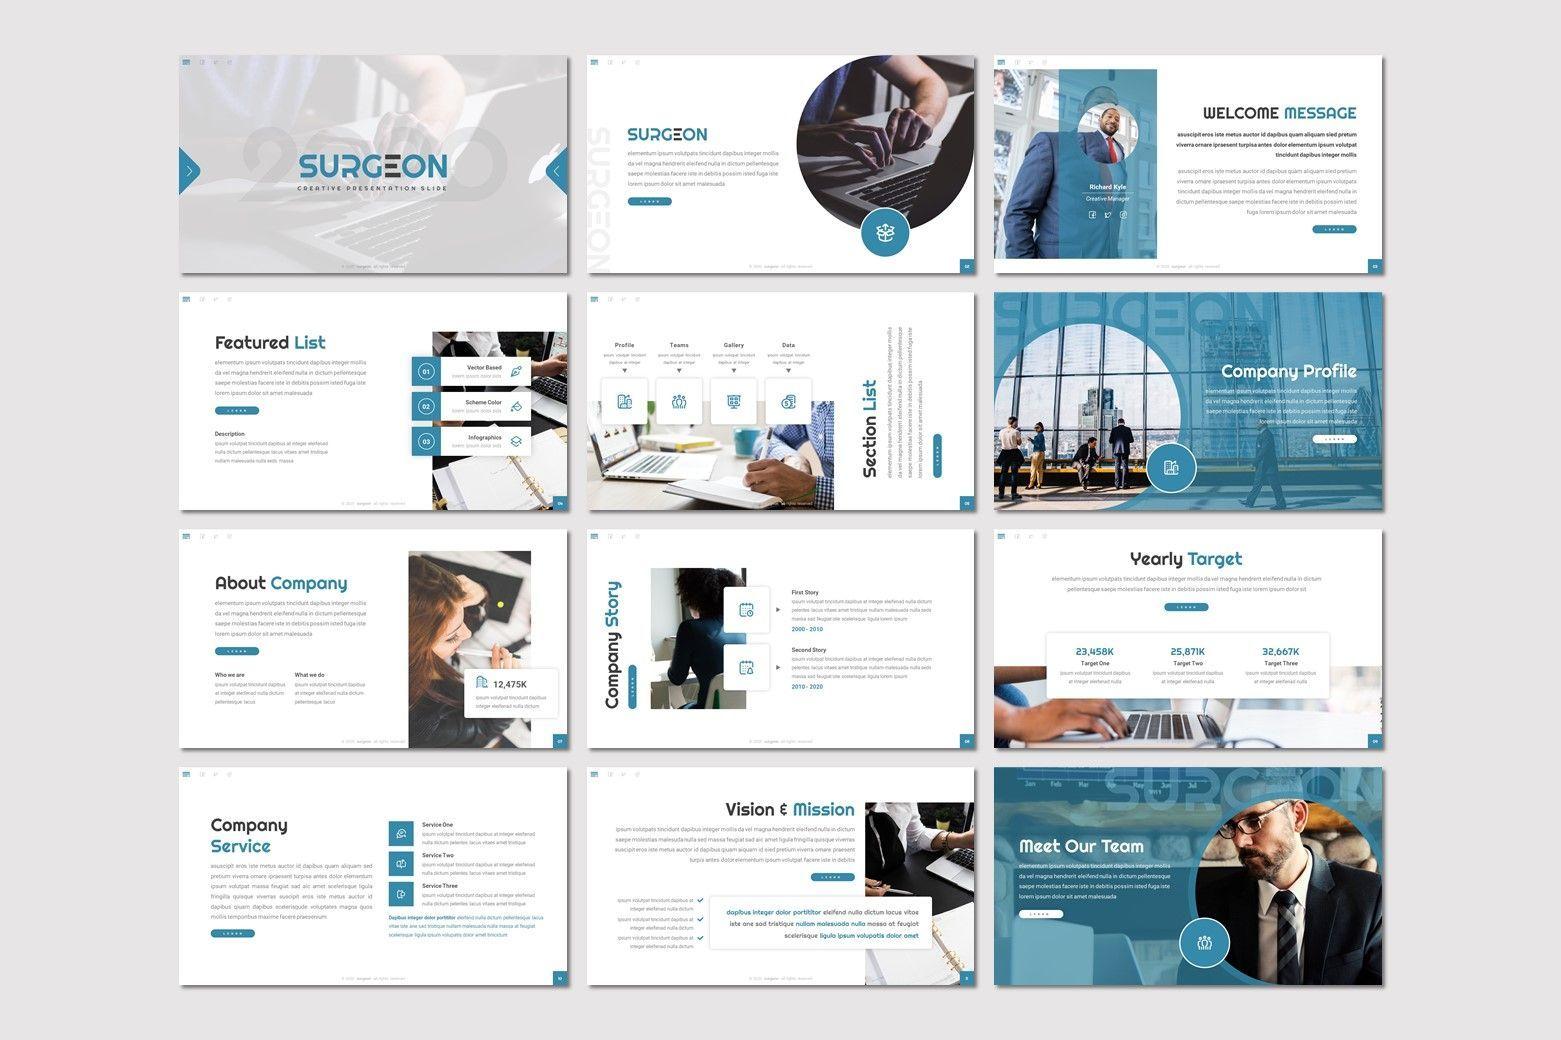 Surgeon - Google Slides Template, Slide 2, 07972, Presentation Templates — PoweredTemplate.com